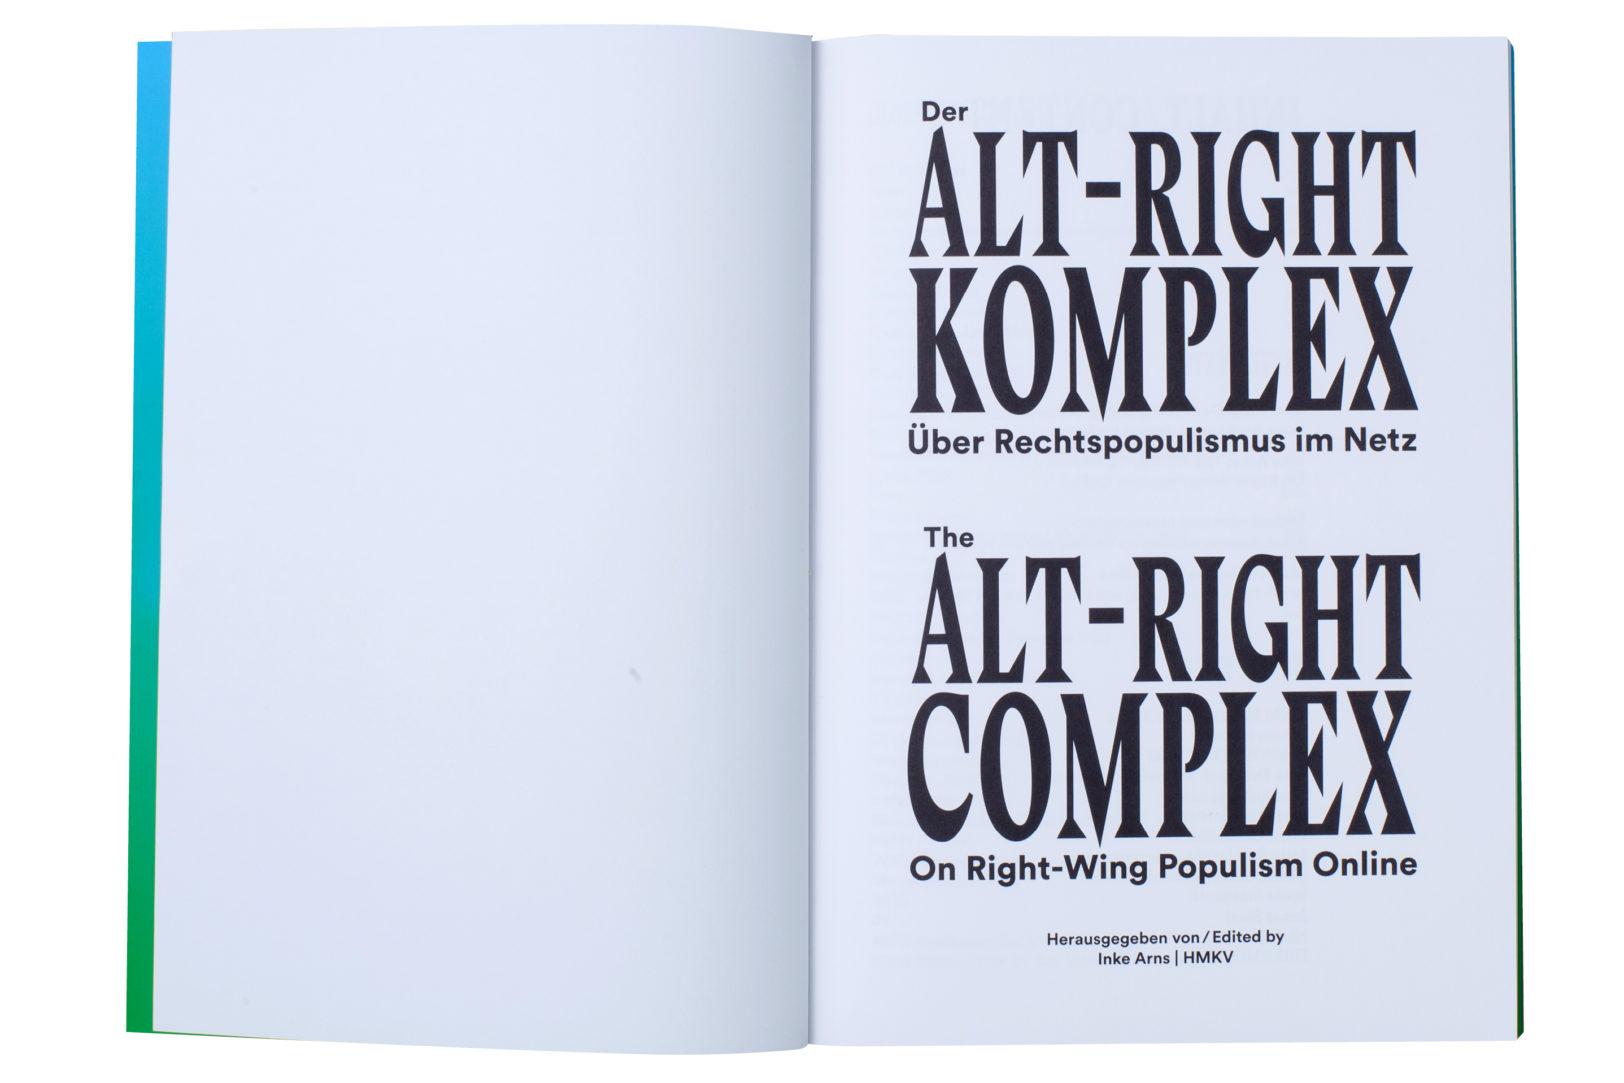 http://e-o-t.de/wordpress/wp-content/uploads/2019/04/eot-books-AltRight-2.jpg